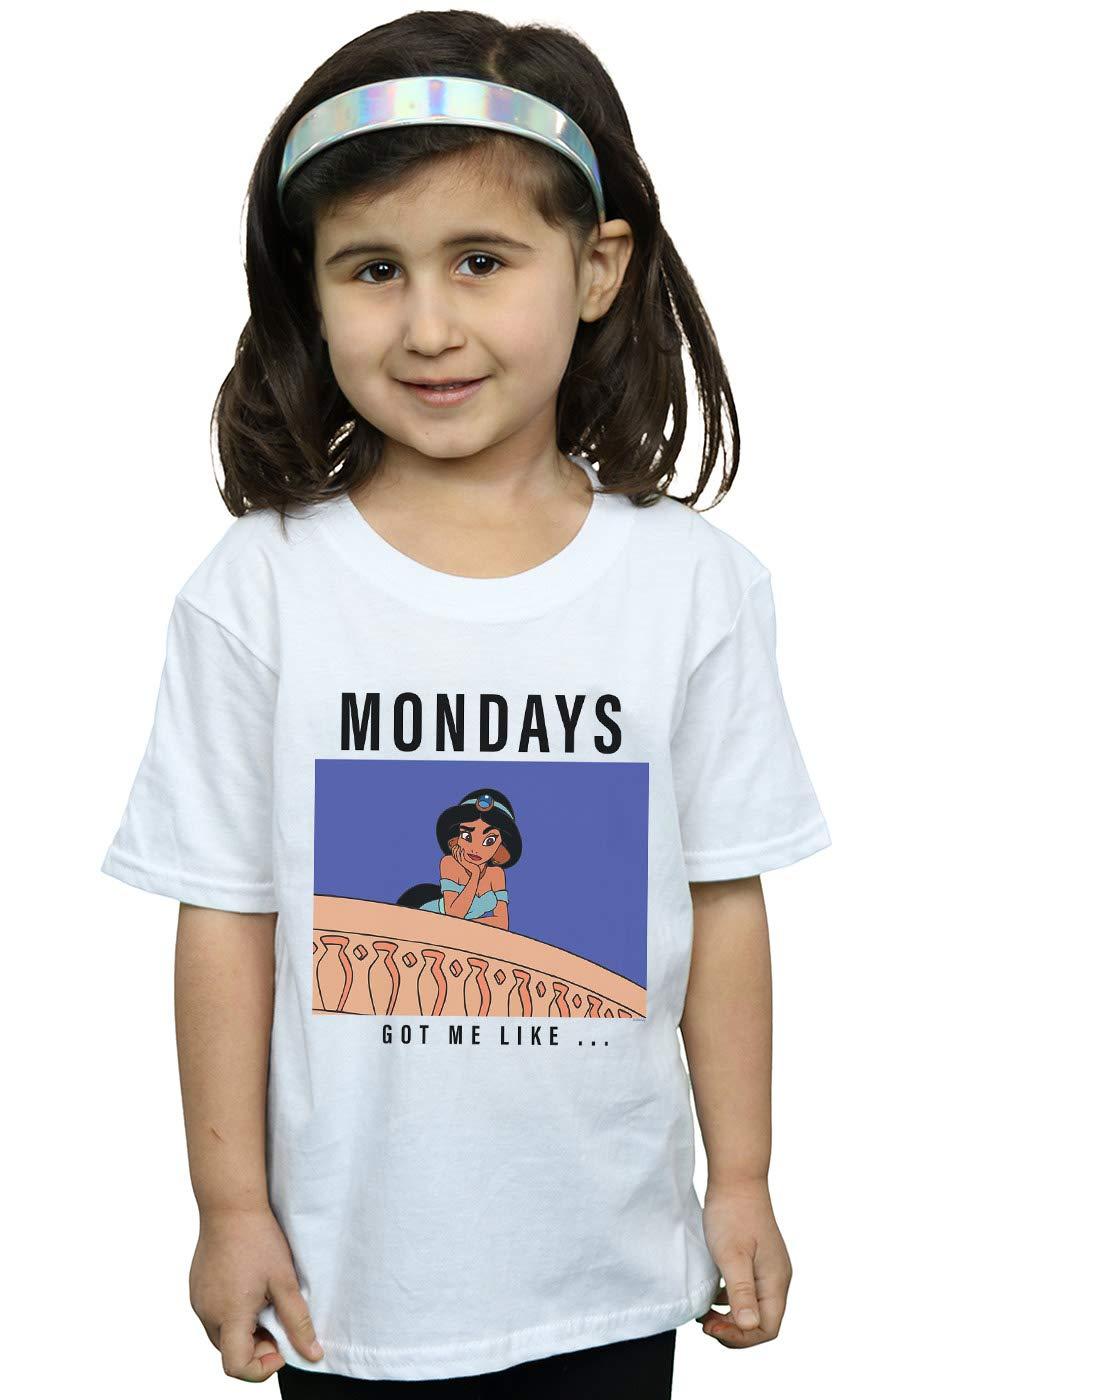 Princess Girls Jasmine Mondays Got Me Like T Shirt 3621